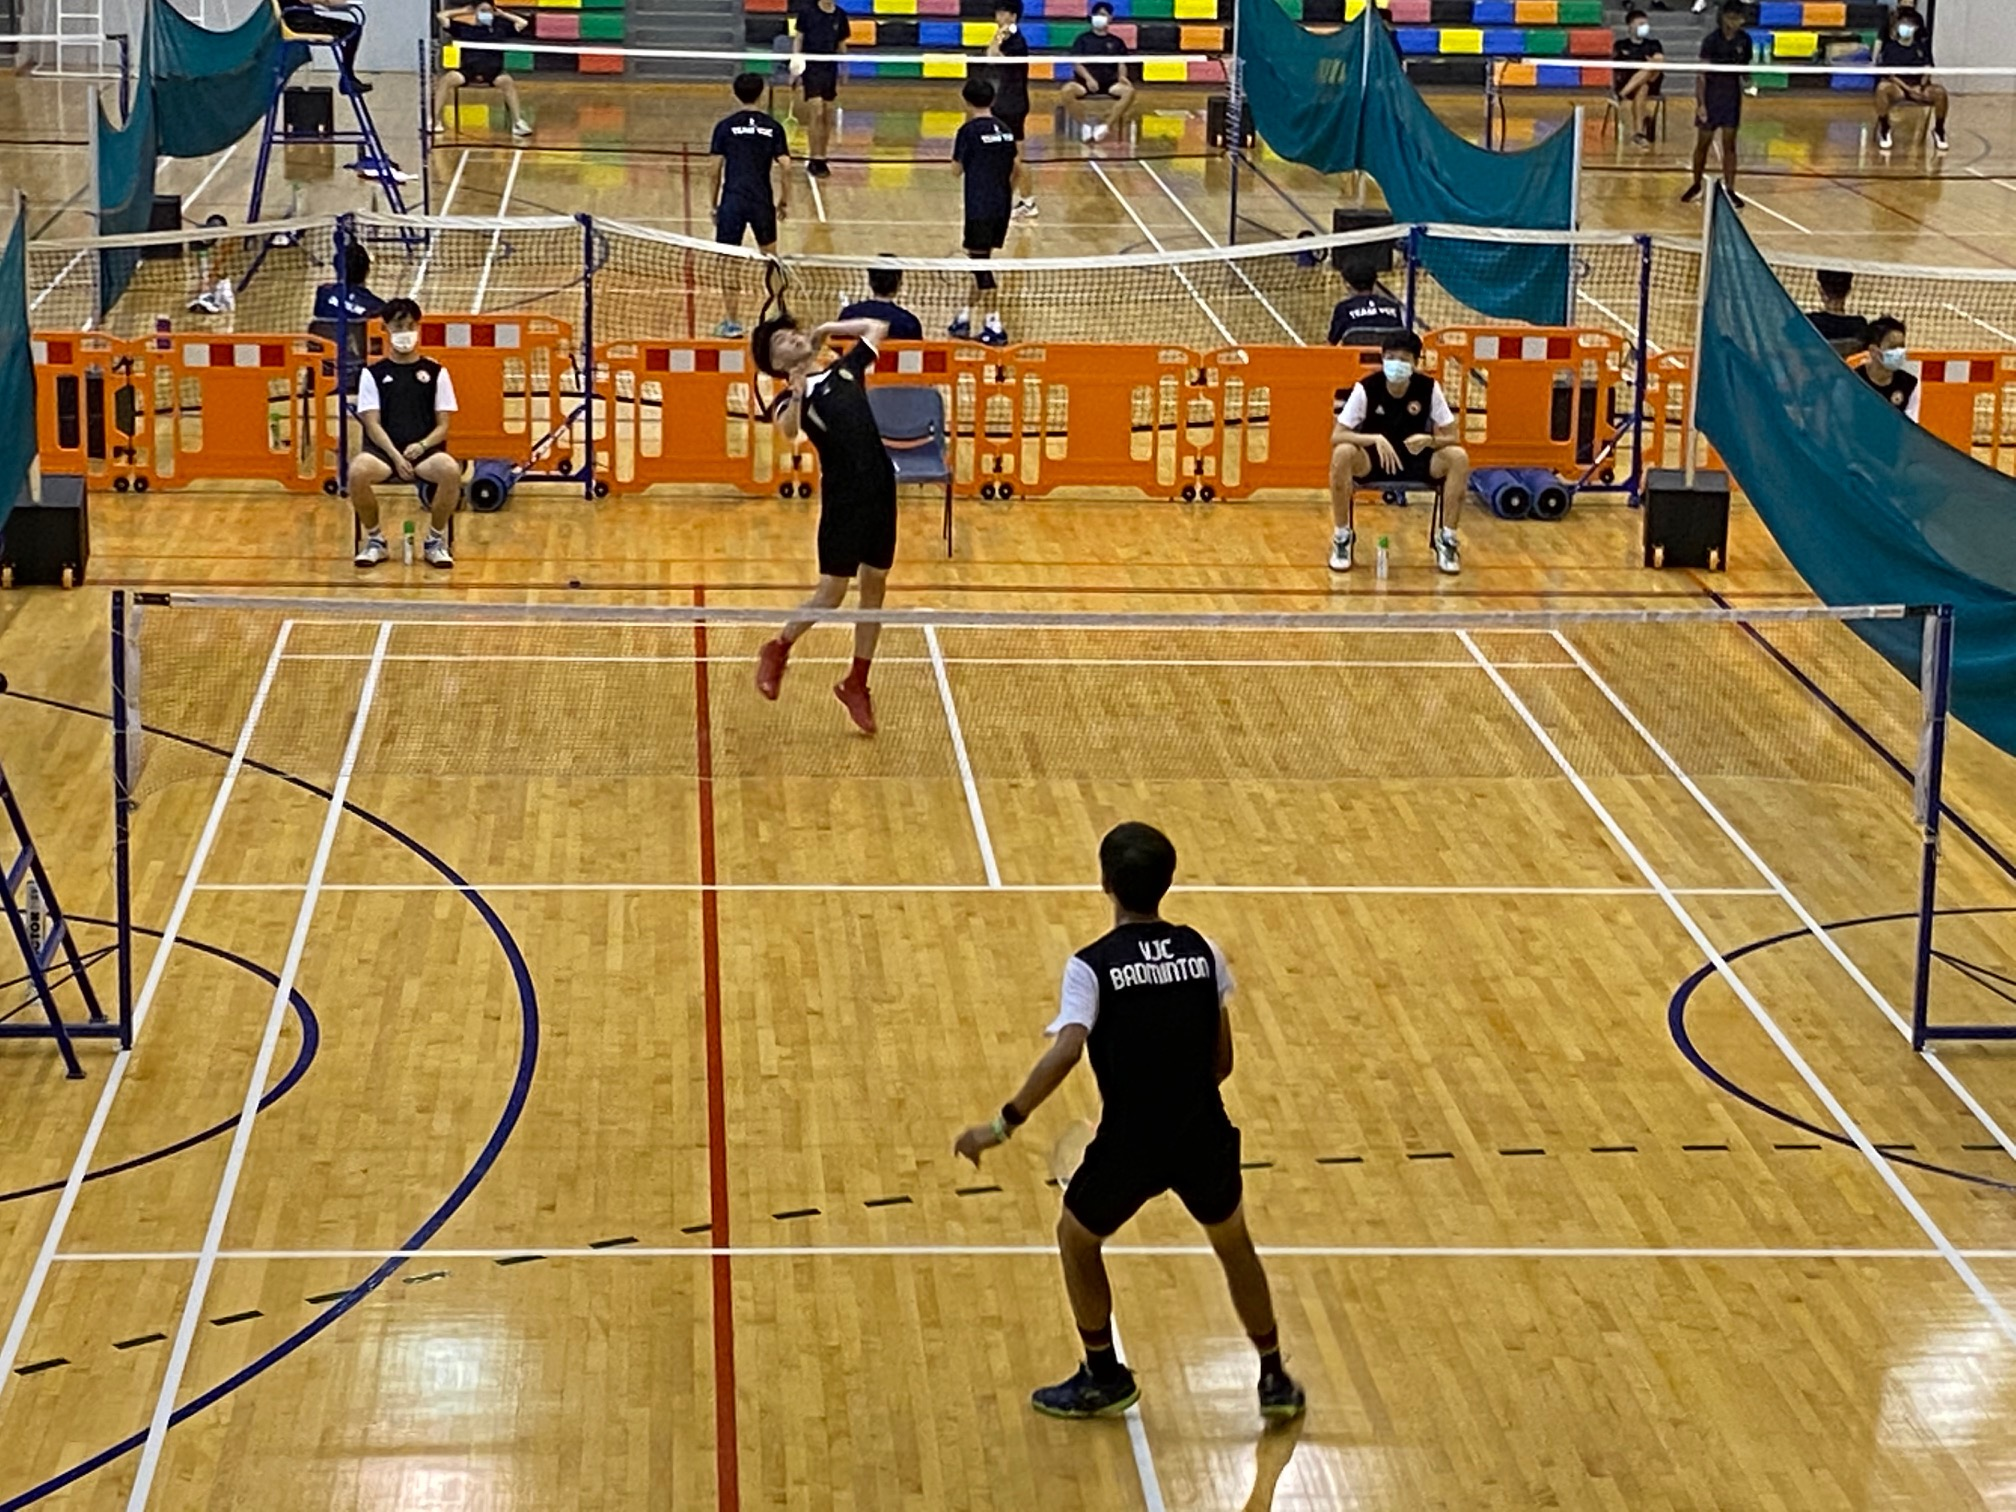 NSG A Div boys badminton - RI vs VJC first singles 2